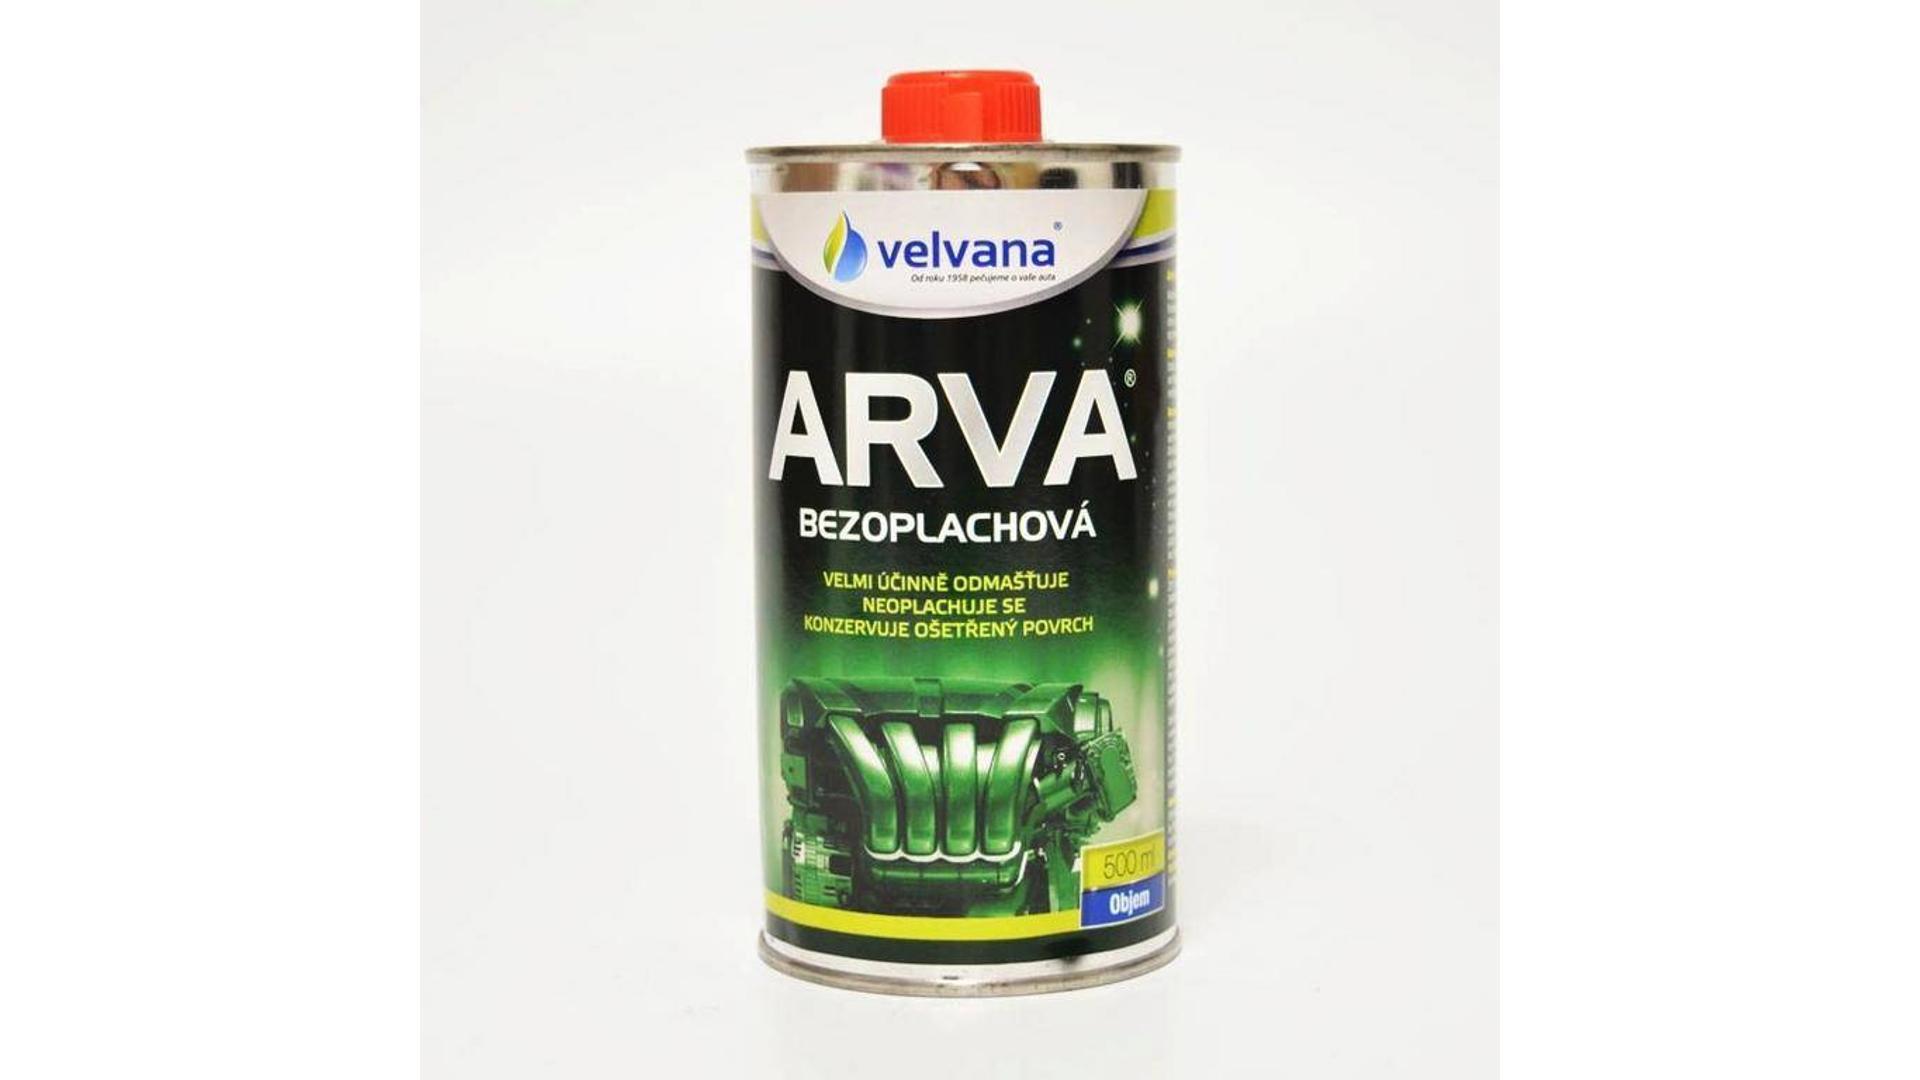 ARVA bezoplachová - plech - 500ml